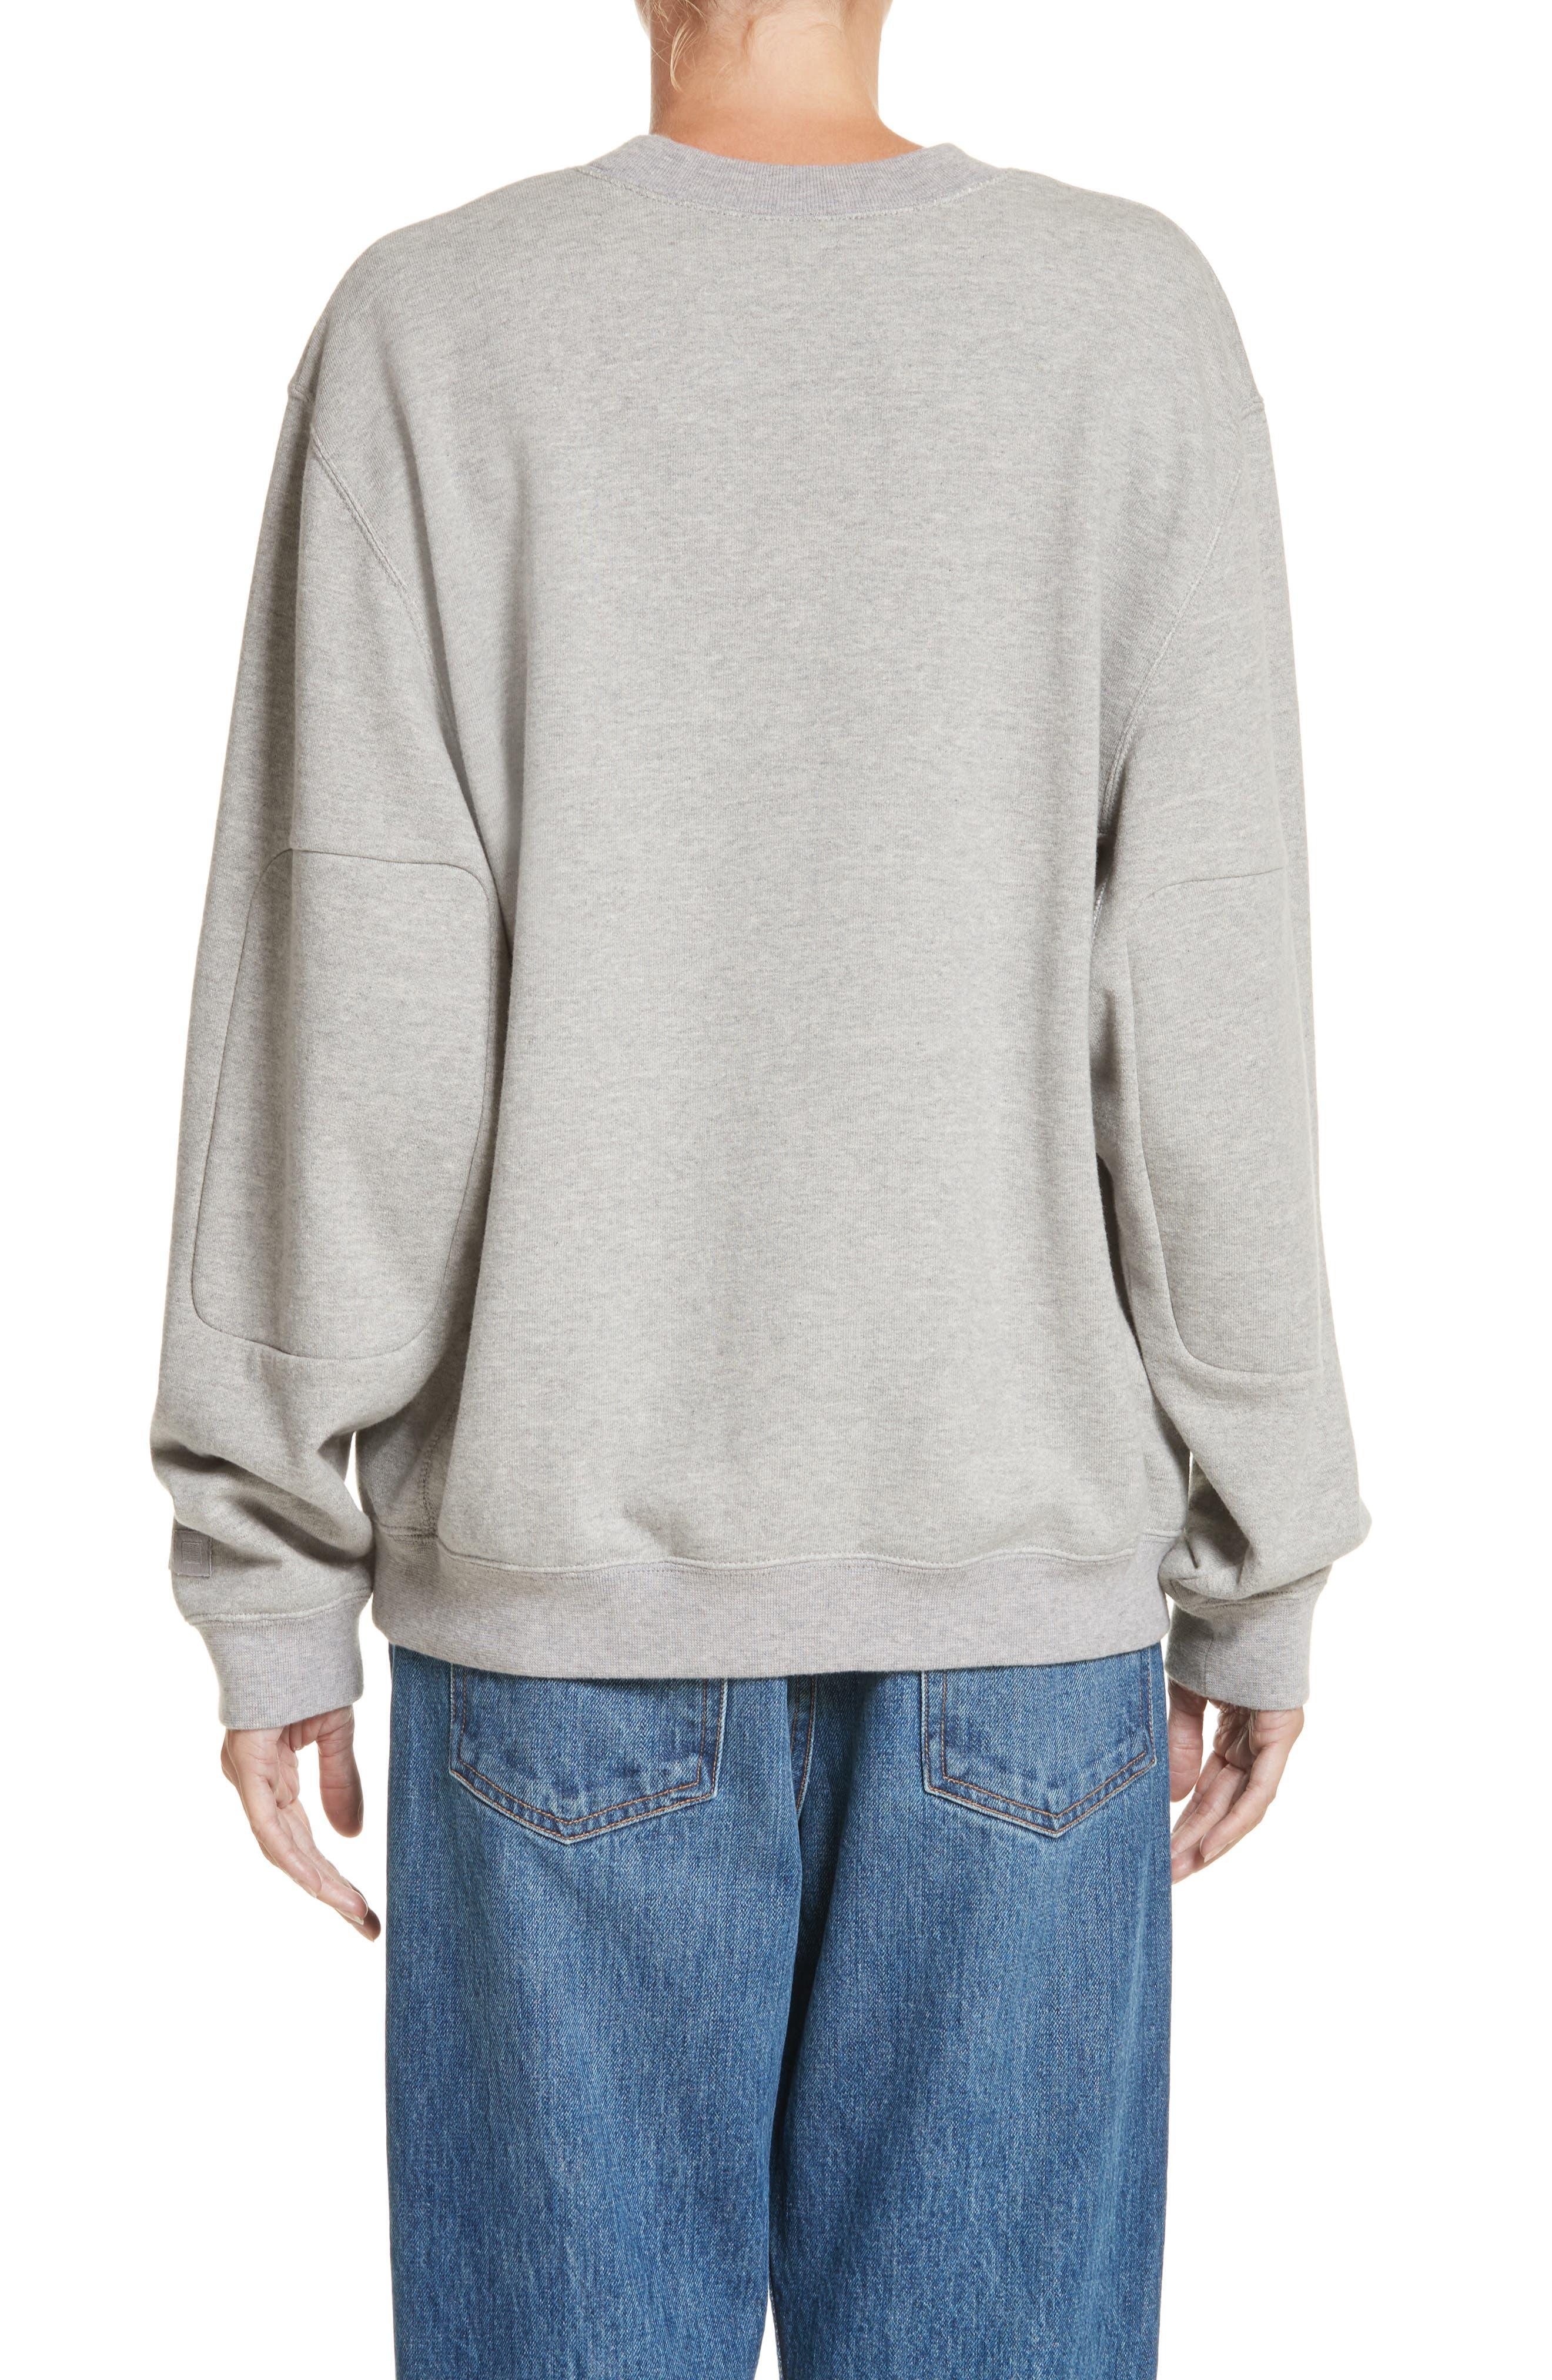 PSWL Graphic Jersey Oversize Sweatshirt,                             Alternate thumbnail 3, color,                             082